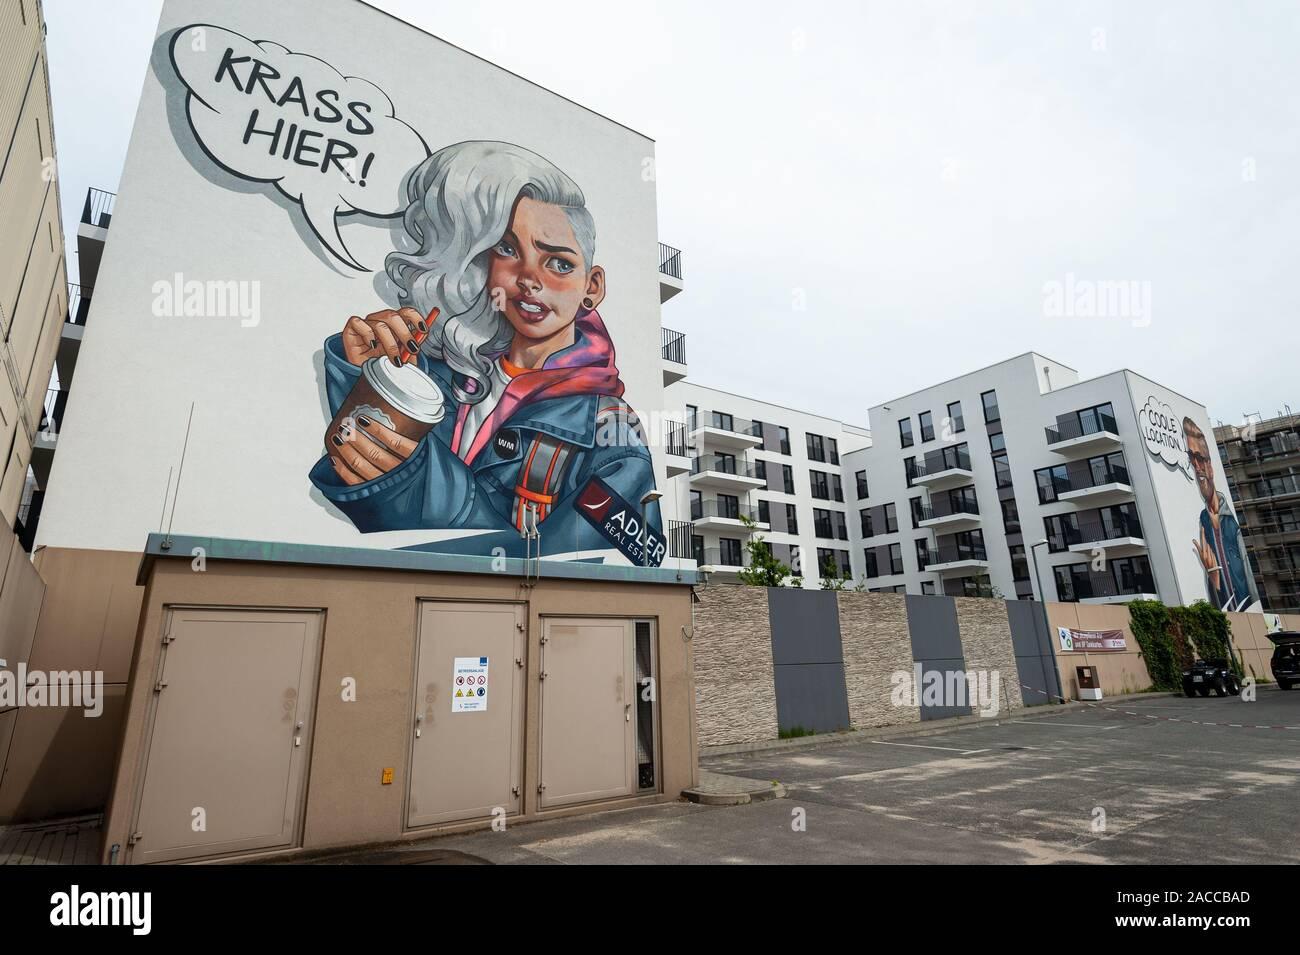 10.06.2019, Berlin, Germany, Europe - New apartment buildings by Adler Real Estate along Heidestrasse in the Europacity in Berlin Moabit. Stock Photo